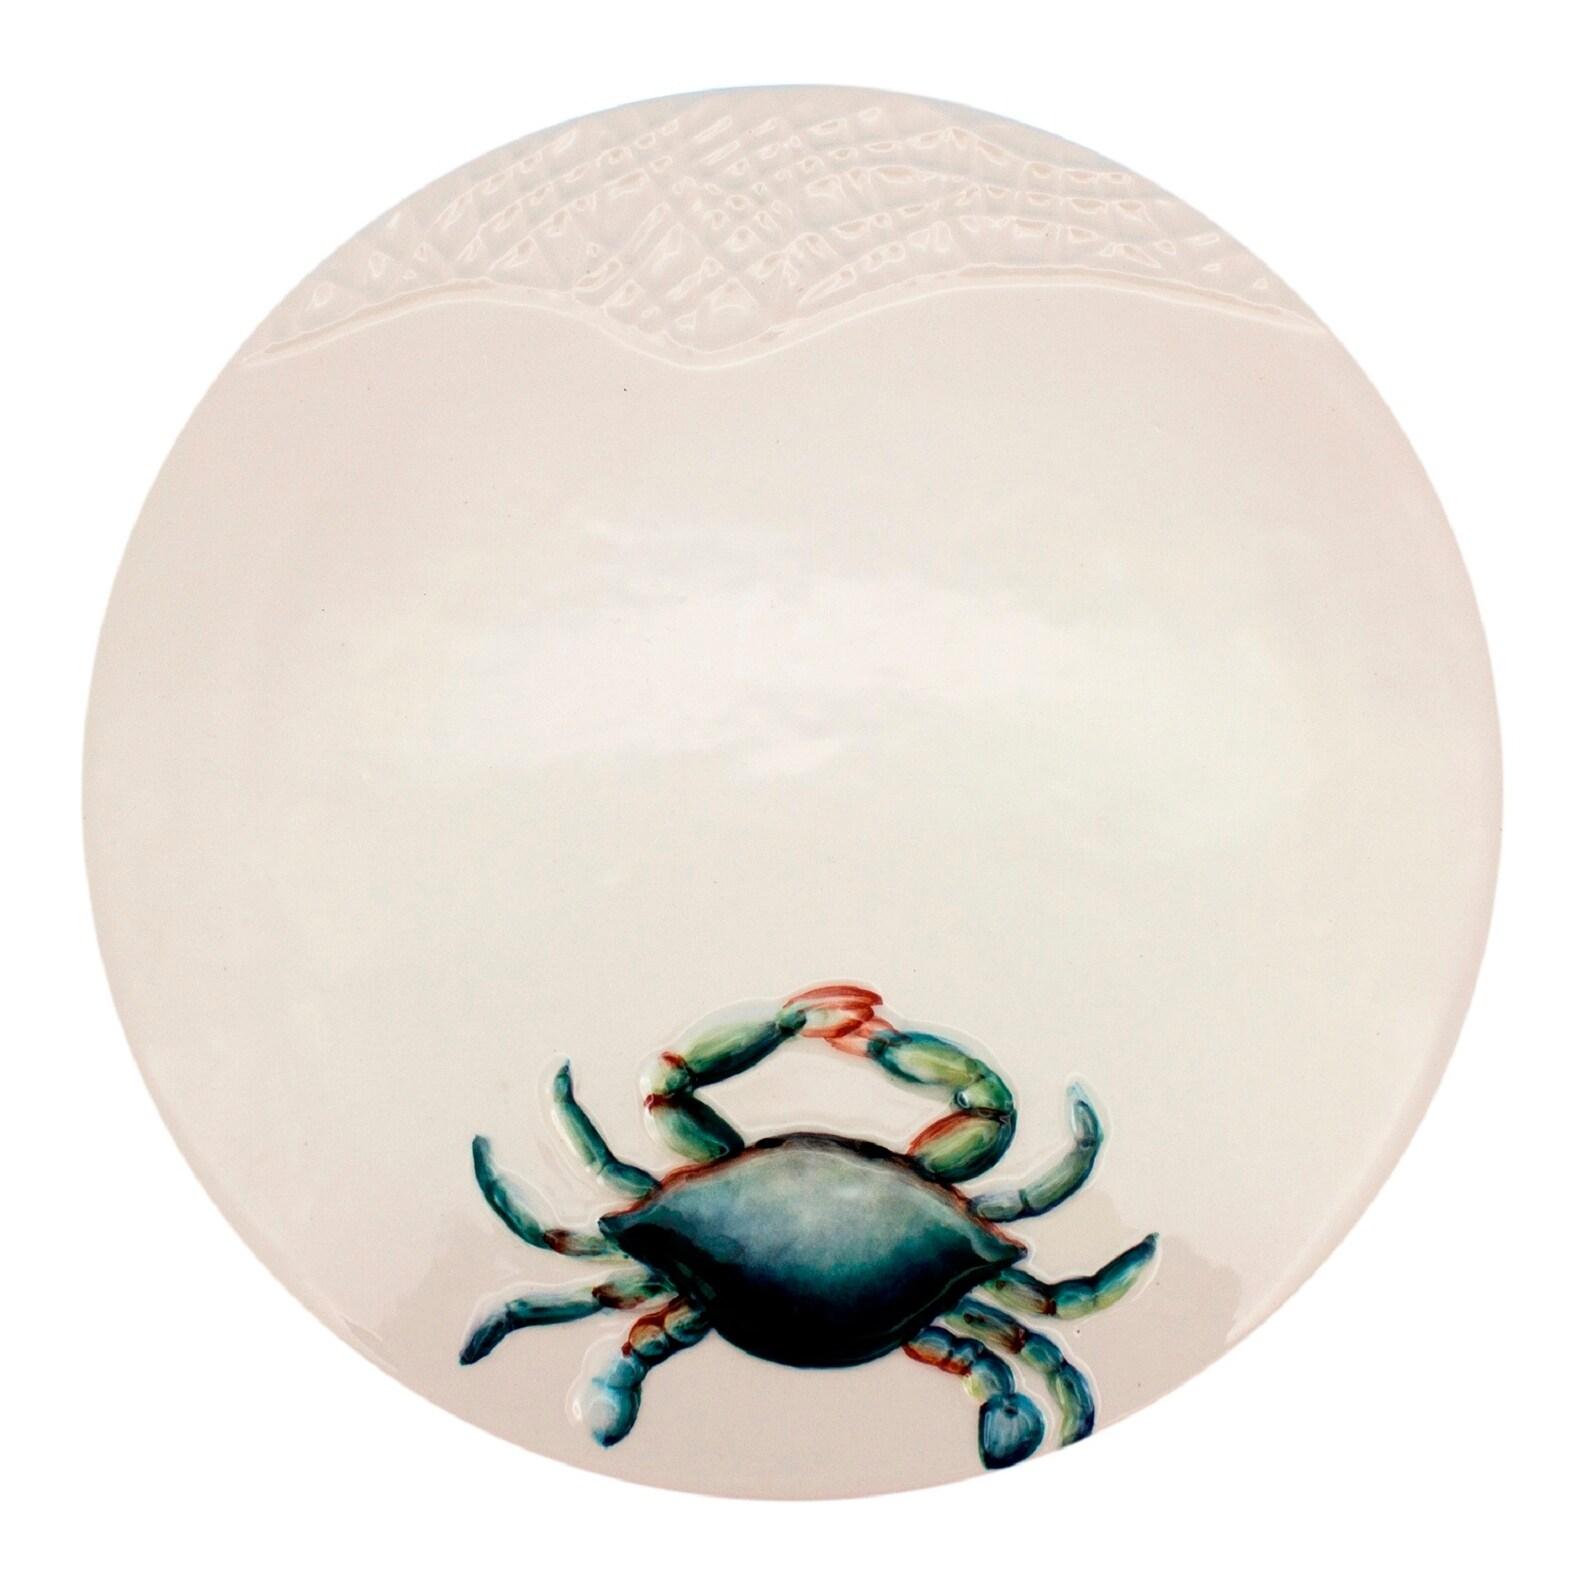 Coastal Blue Crab on White Trivet Kitchen Dining Table 7 Inch Ceramic